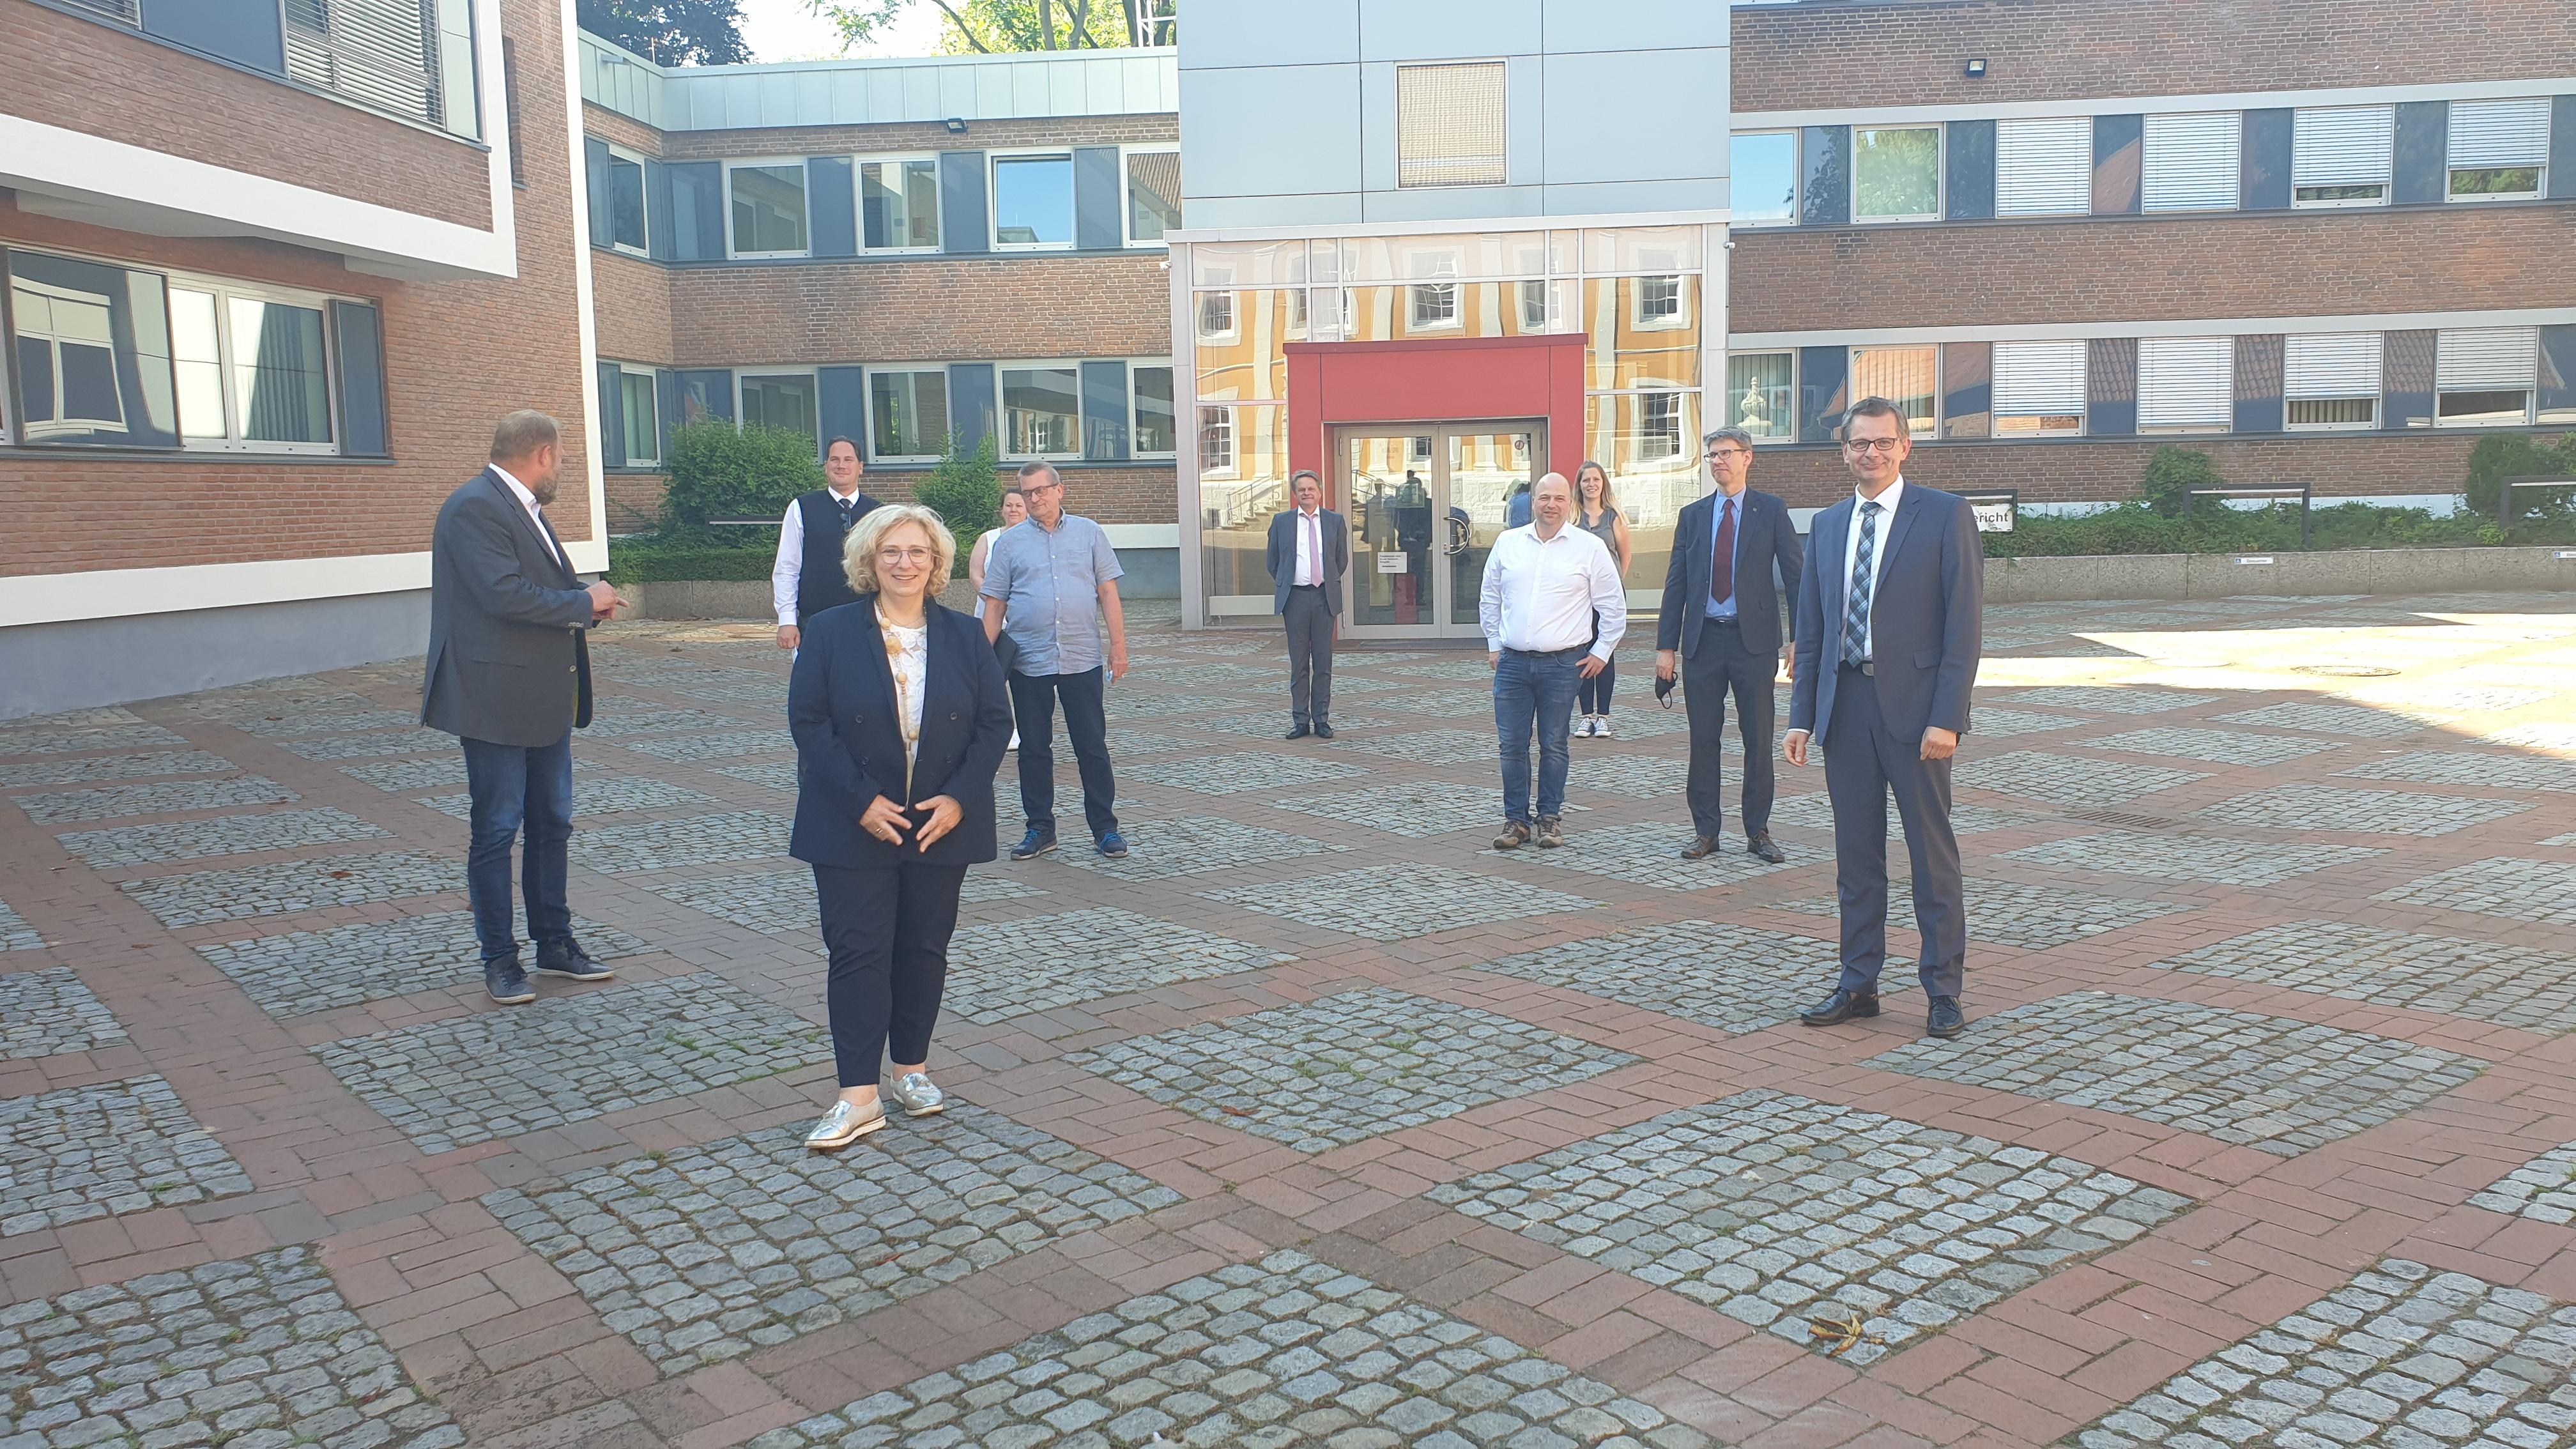 Dr. Daniela De Ridder und Ulf Prange (MdL) zu Gast beim Amtsgericht Lingen